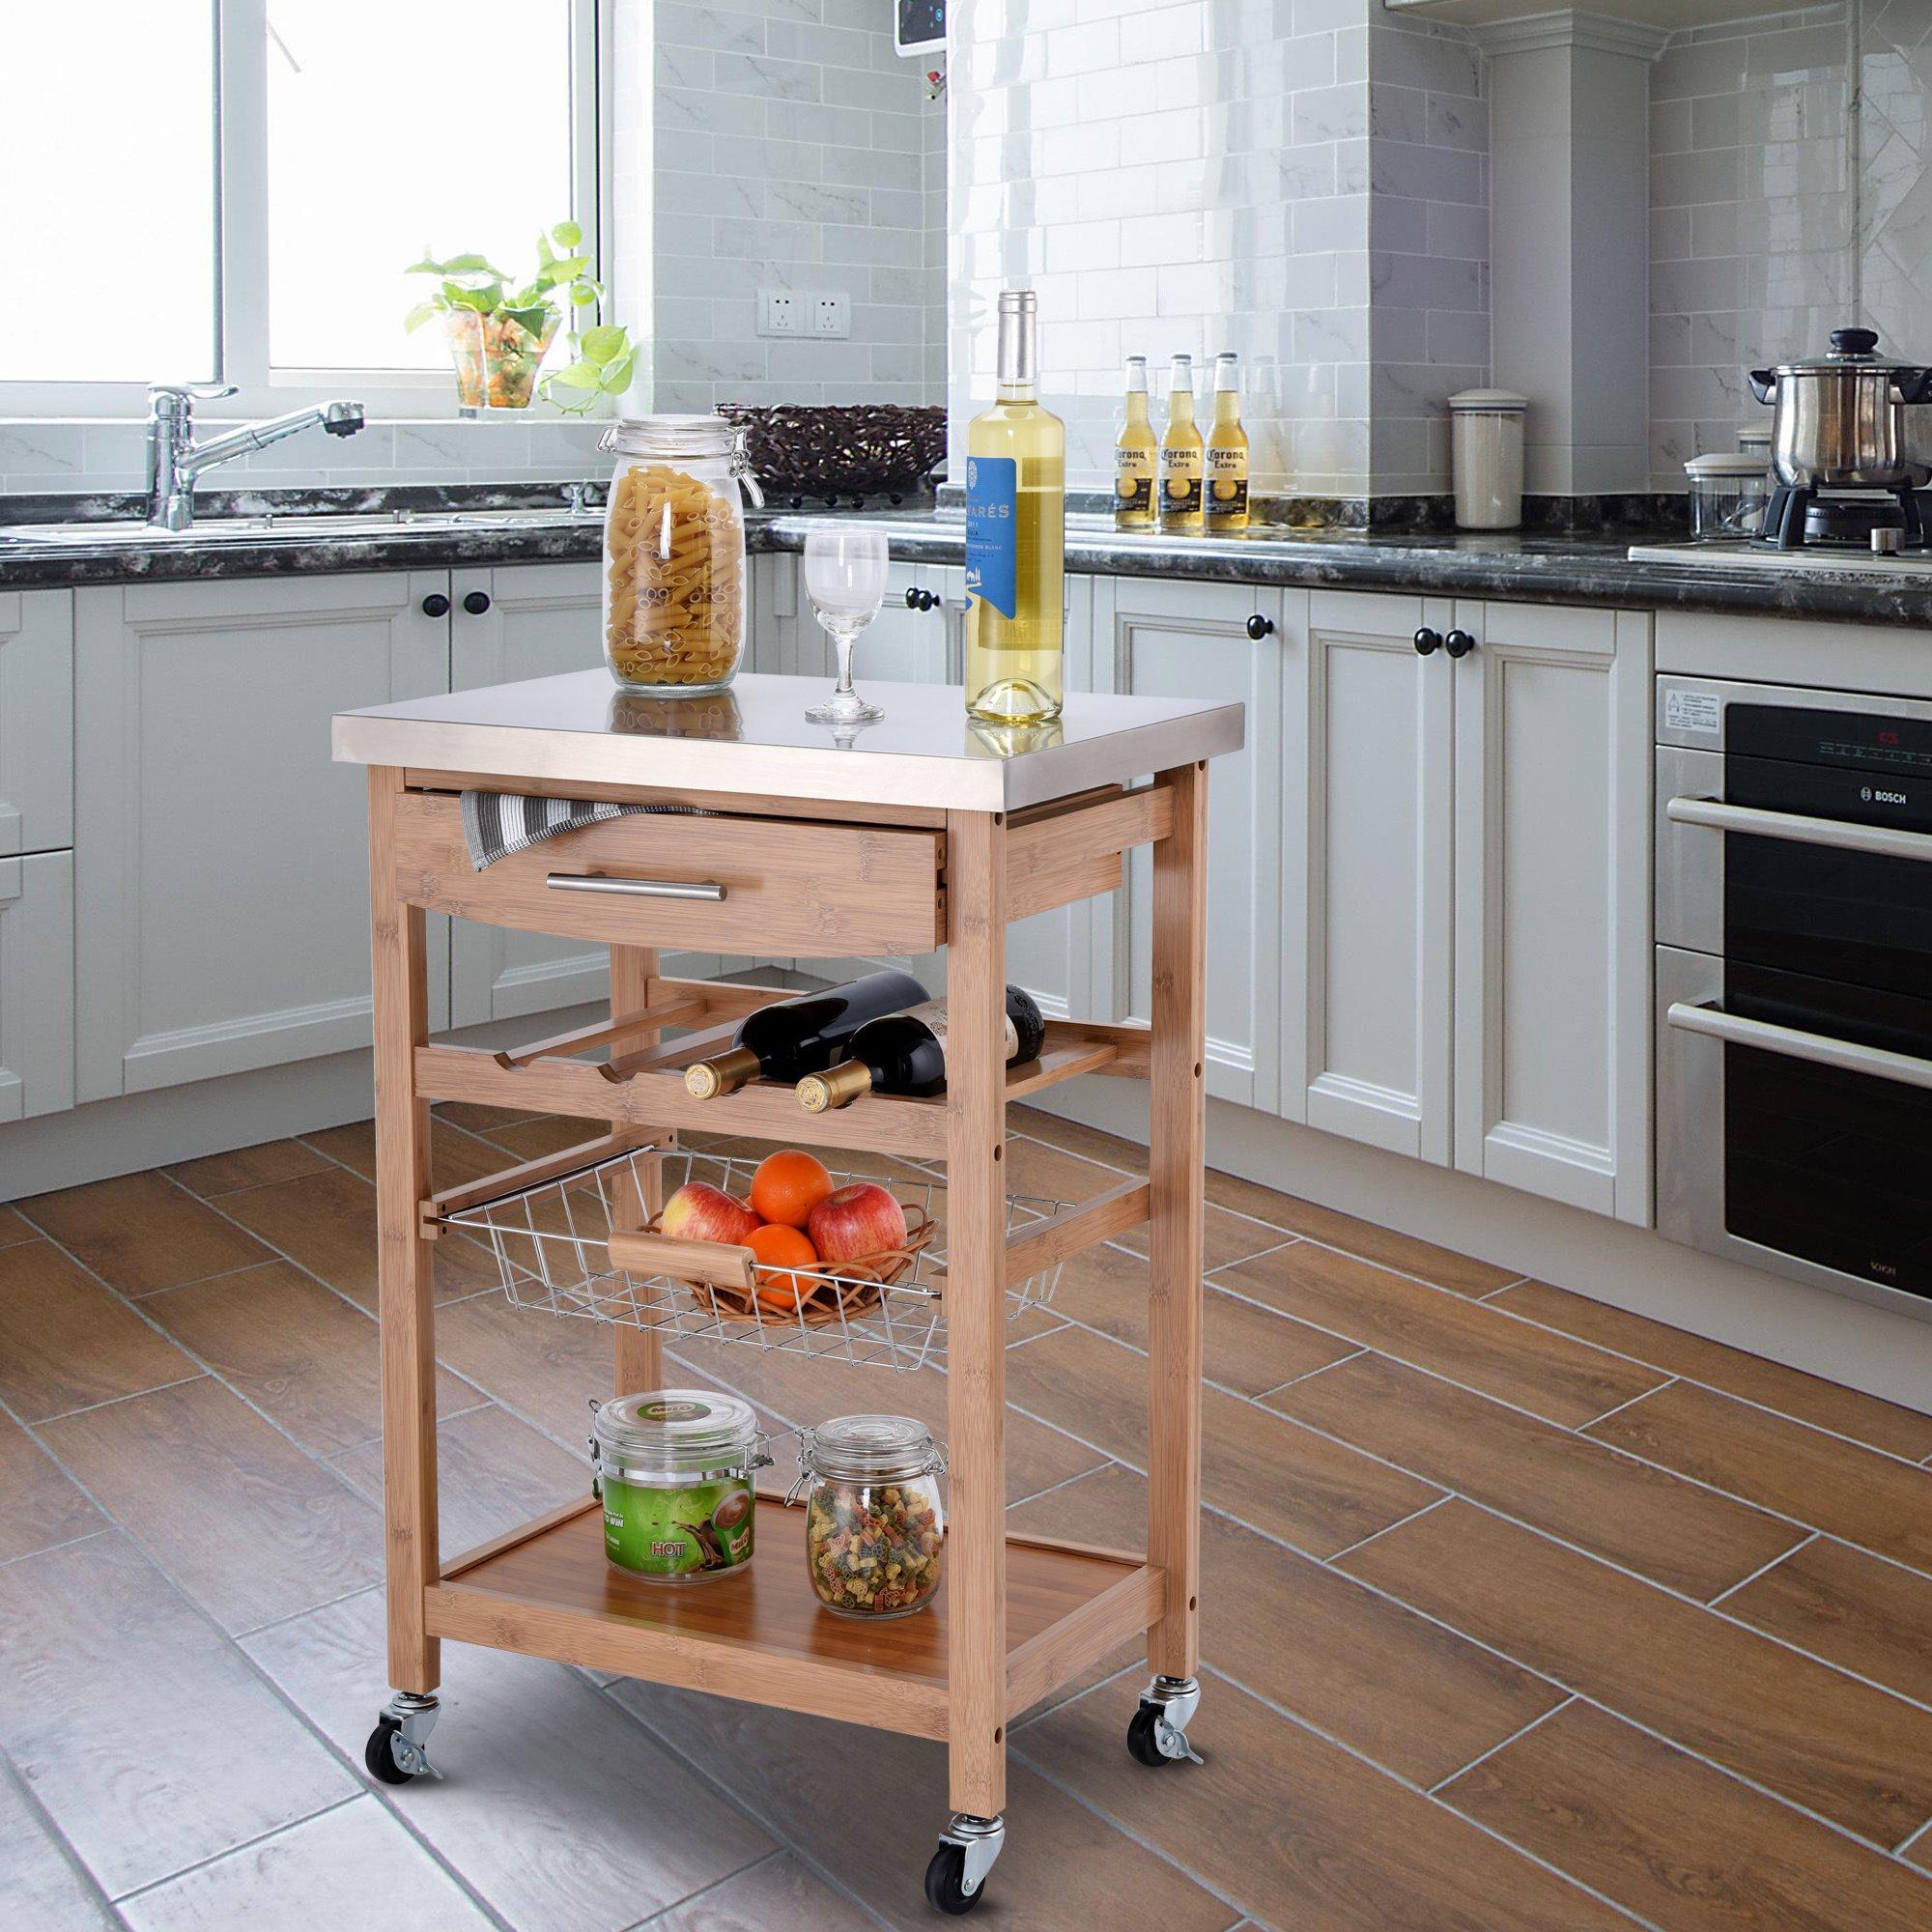 Giantex Kitchen Island Trolley Cart w/Wine Rack Drawer Storage Shelf Basket Bamboo Island Serving Cart w/Stainless Tabletop 4 Casters 2 Lockable